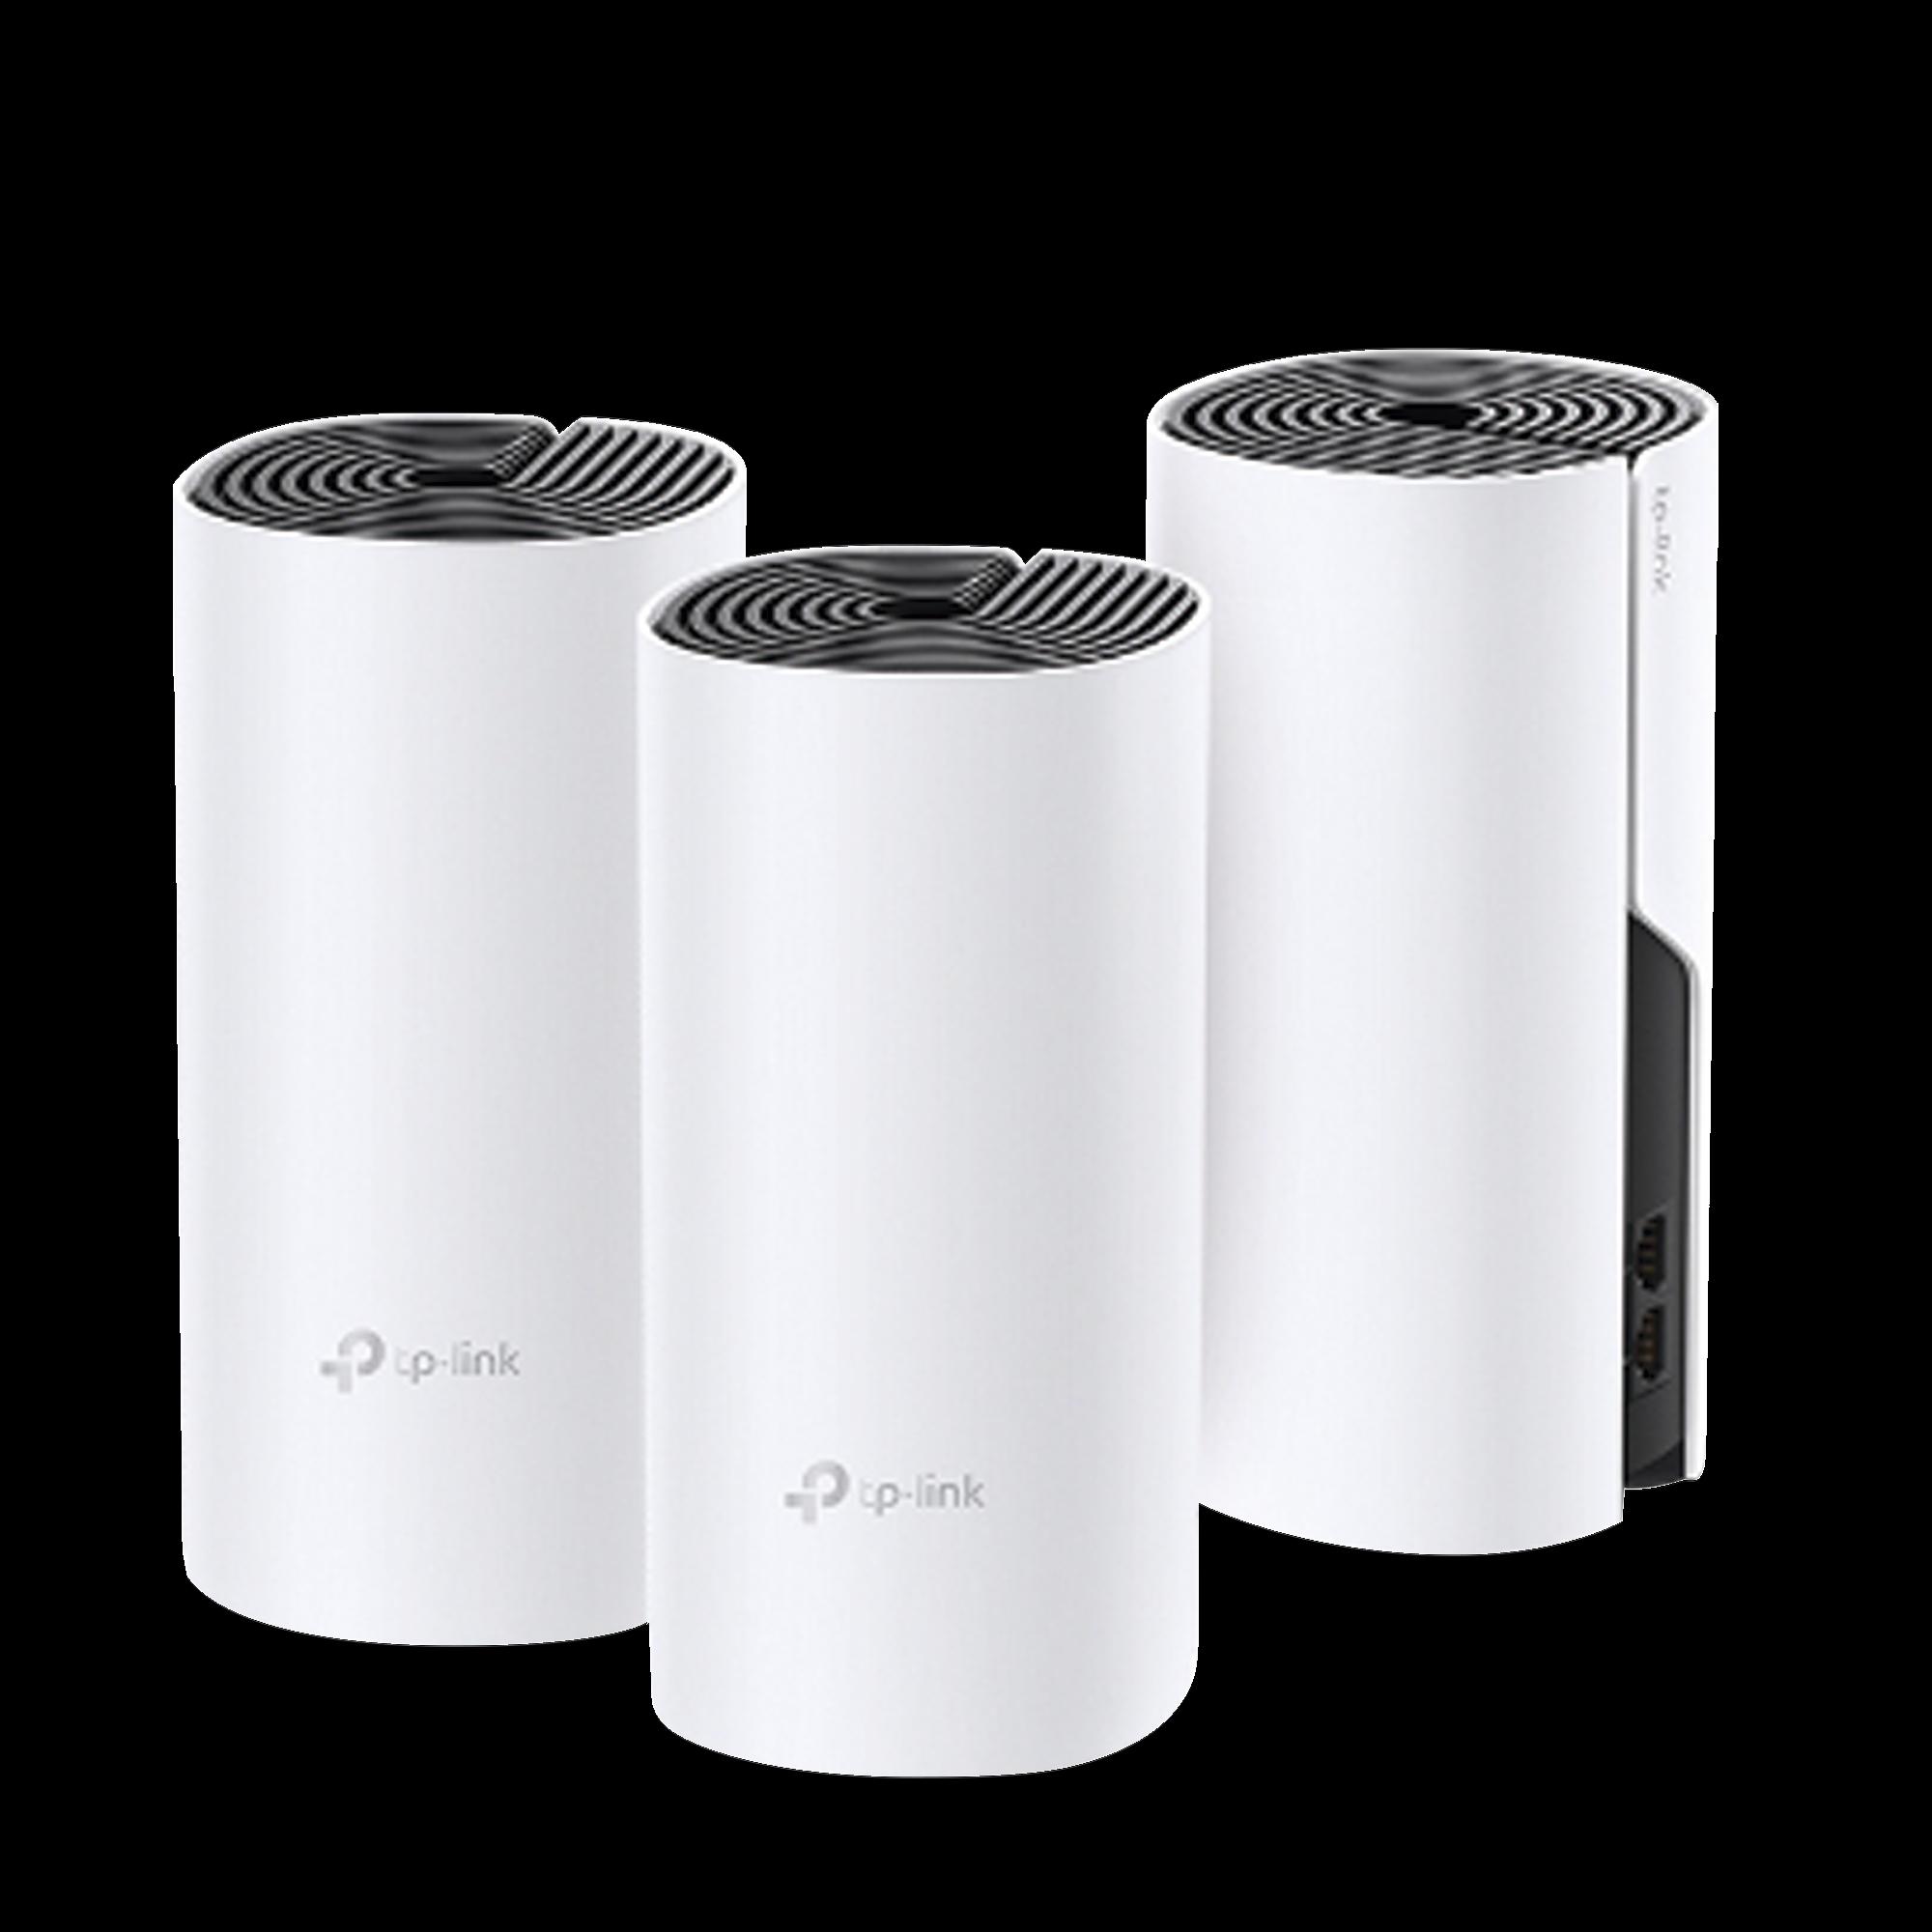 KIT de sistema inalámbrico y HomePlug AV1000, Deco P9 mesh hibrido para hogar, doble banda AC, doble puerto Gigabit, 2 antenas internas compatible con Alexa.